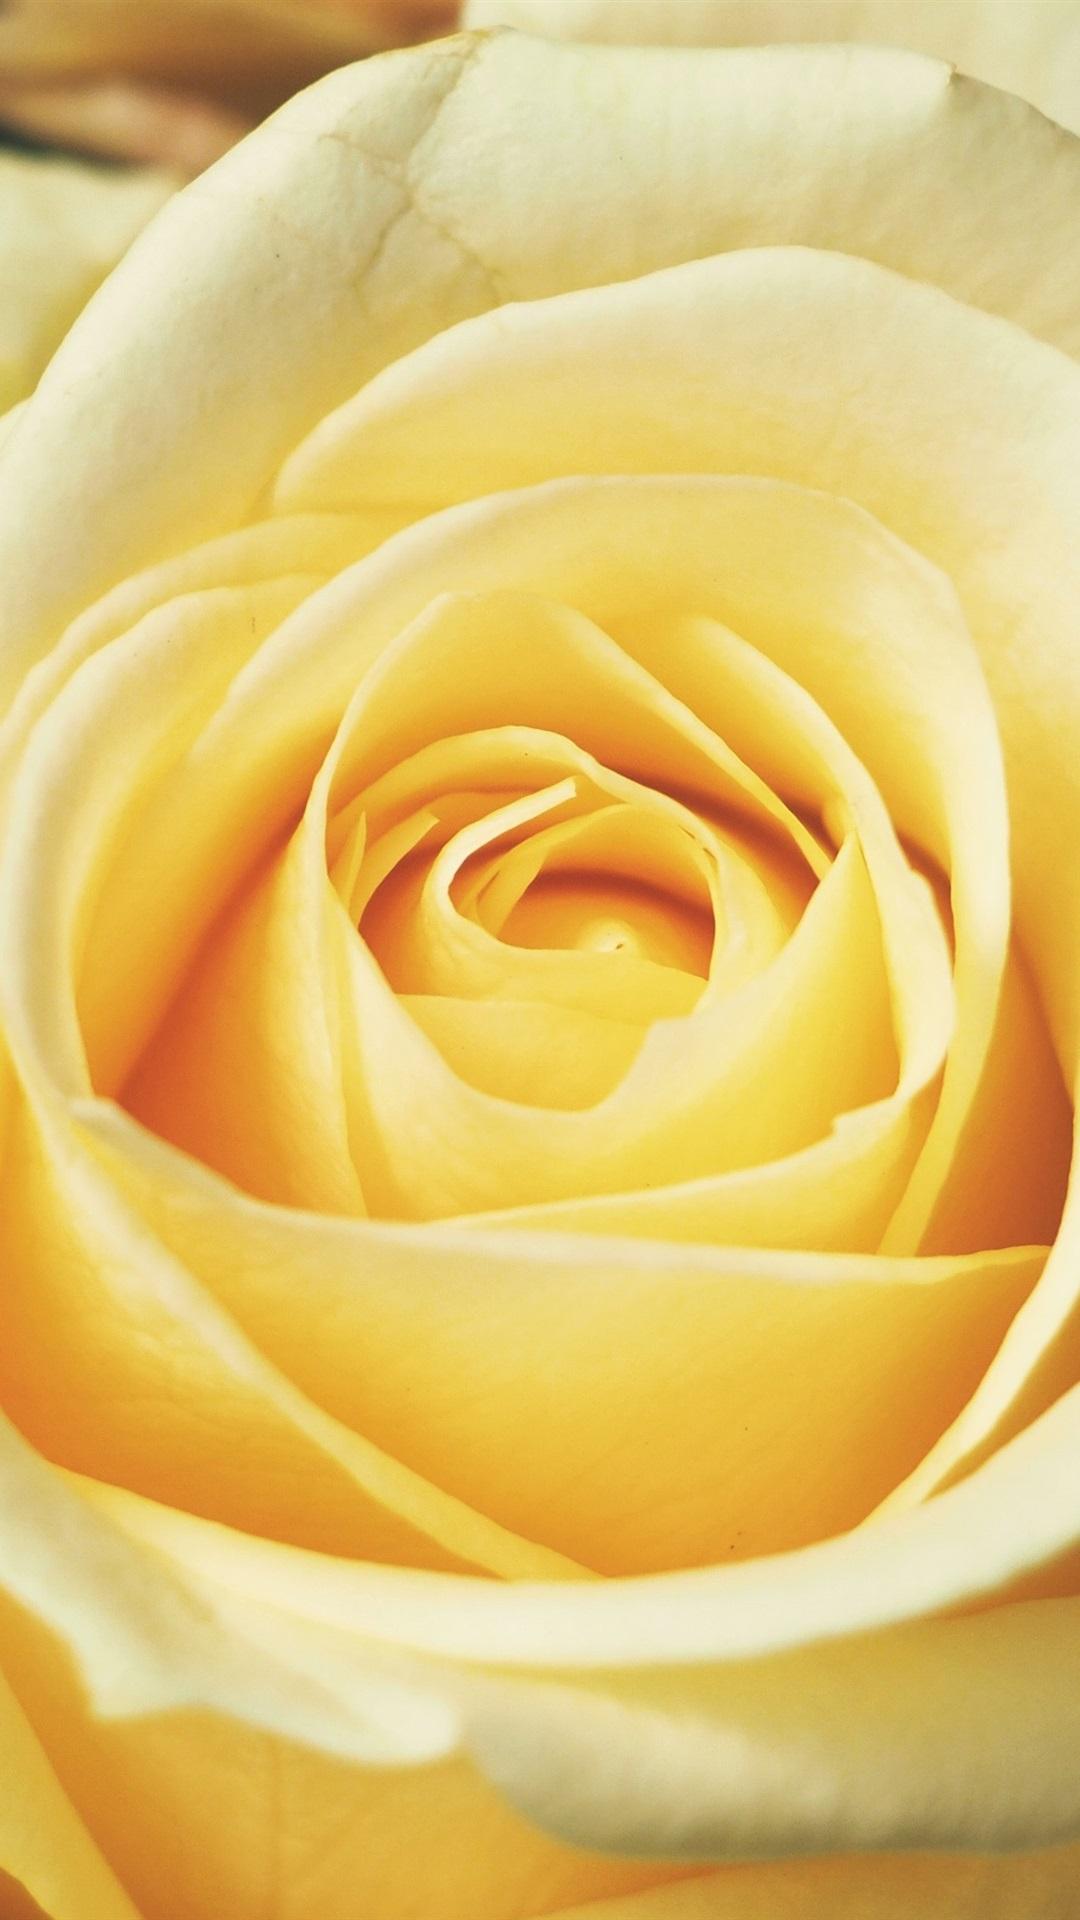 Light Yellow Rose Close Up 1080x1920 Iphone 8766s Plus